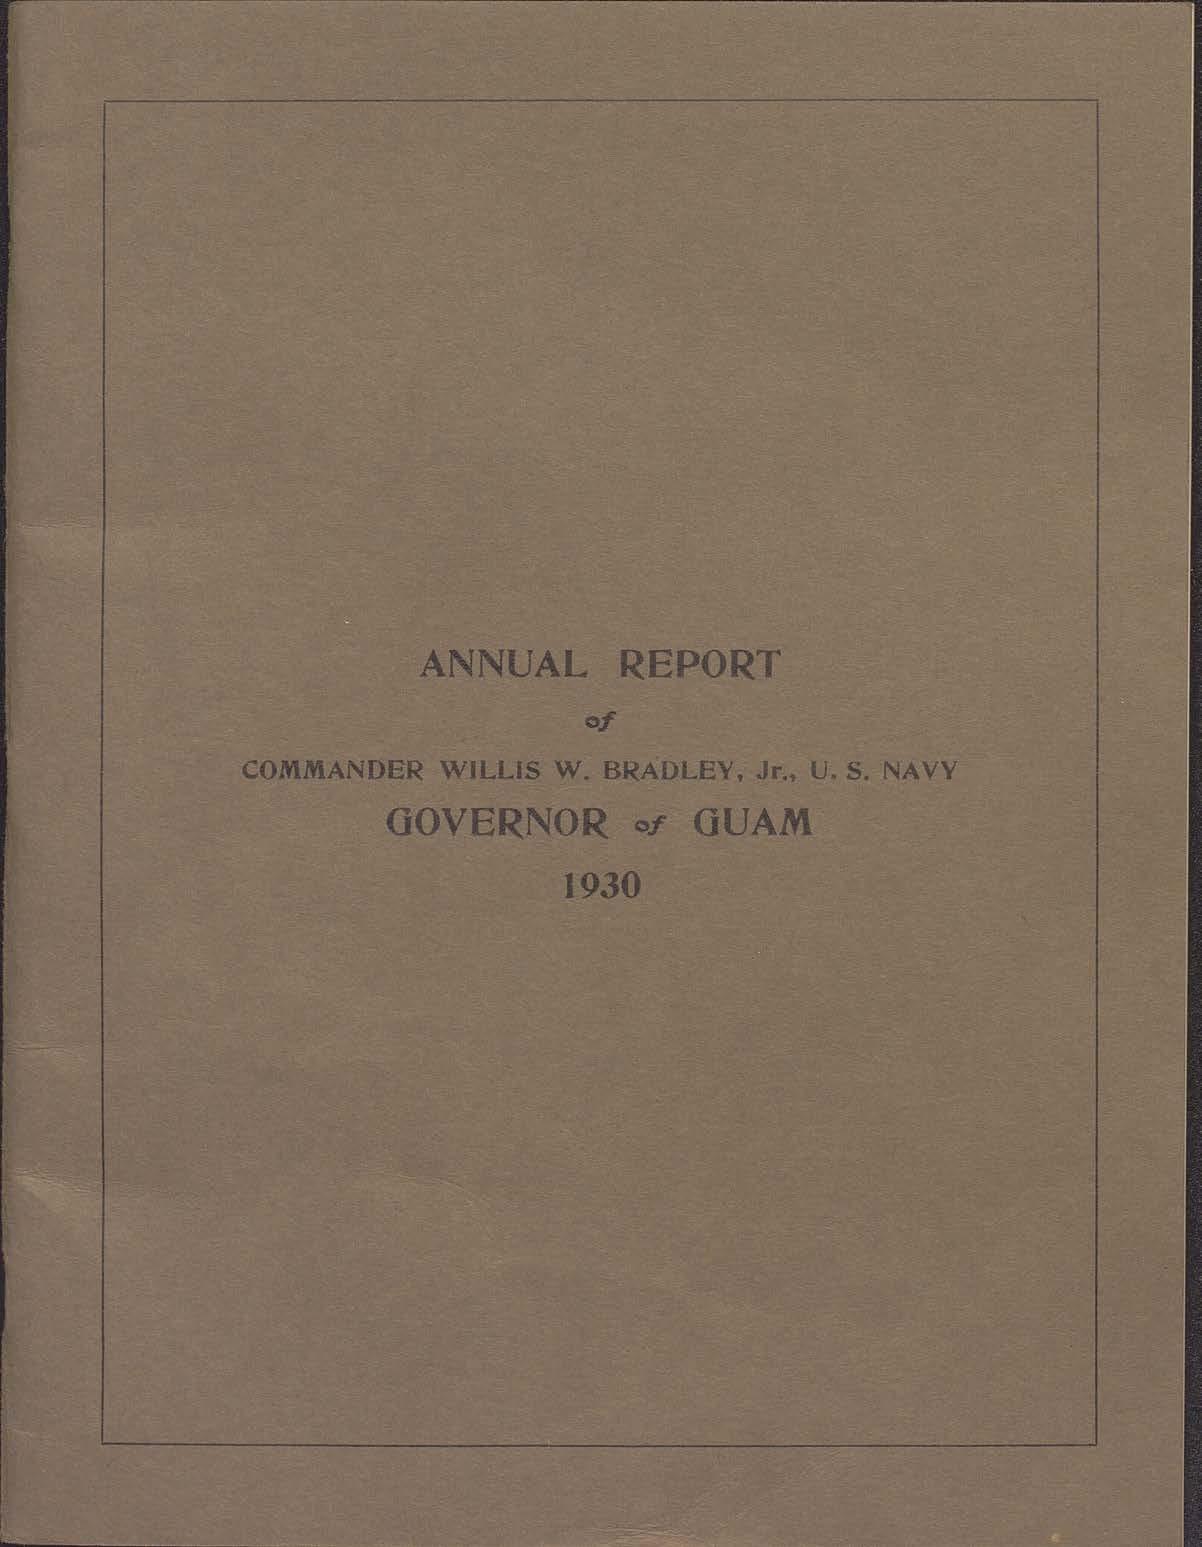 Annual Report - Governor of Guam